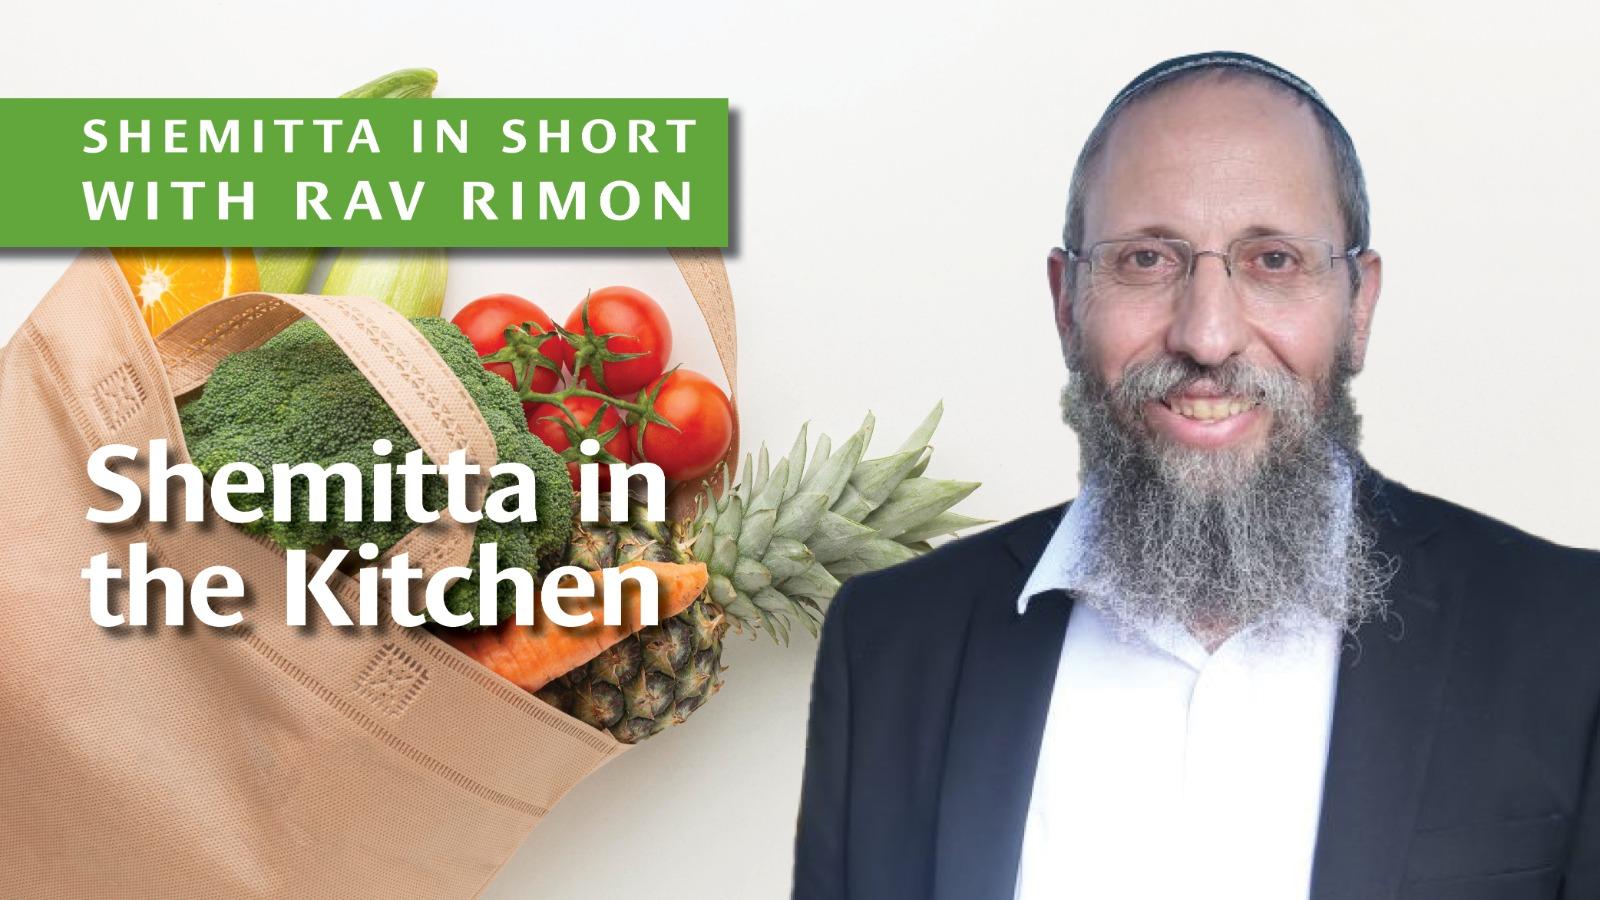 Shemitta in the Kitchen